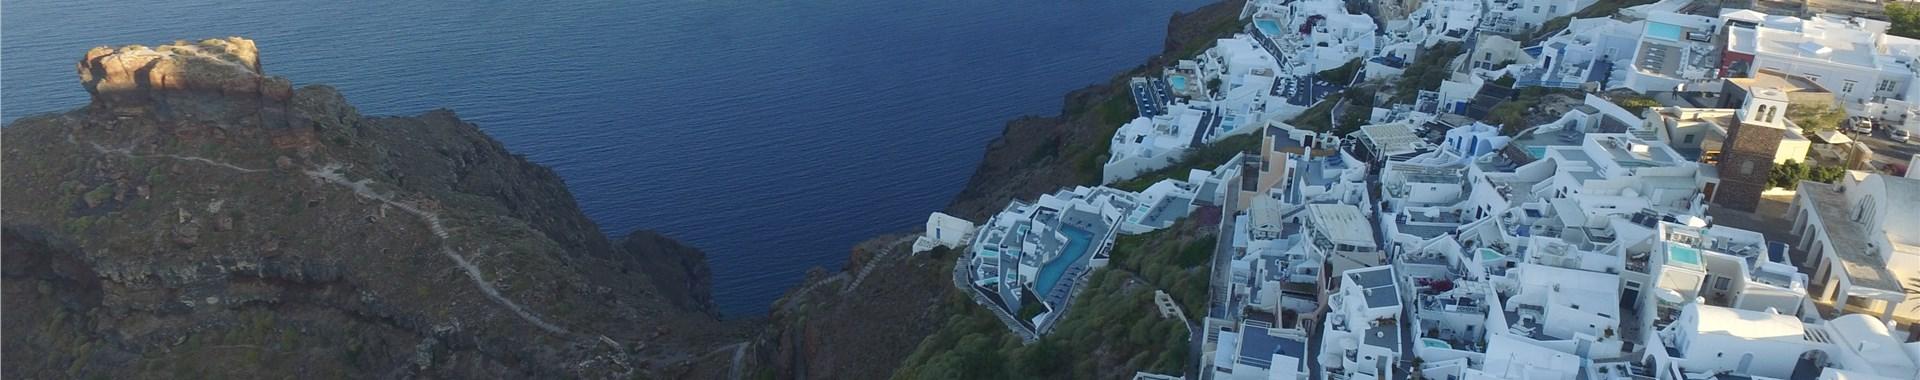 Imerovigli Imerovigli Hotels in Santorini island, Greece